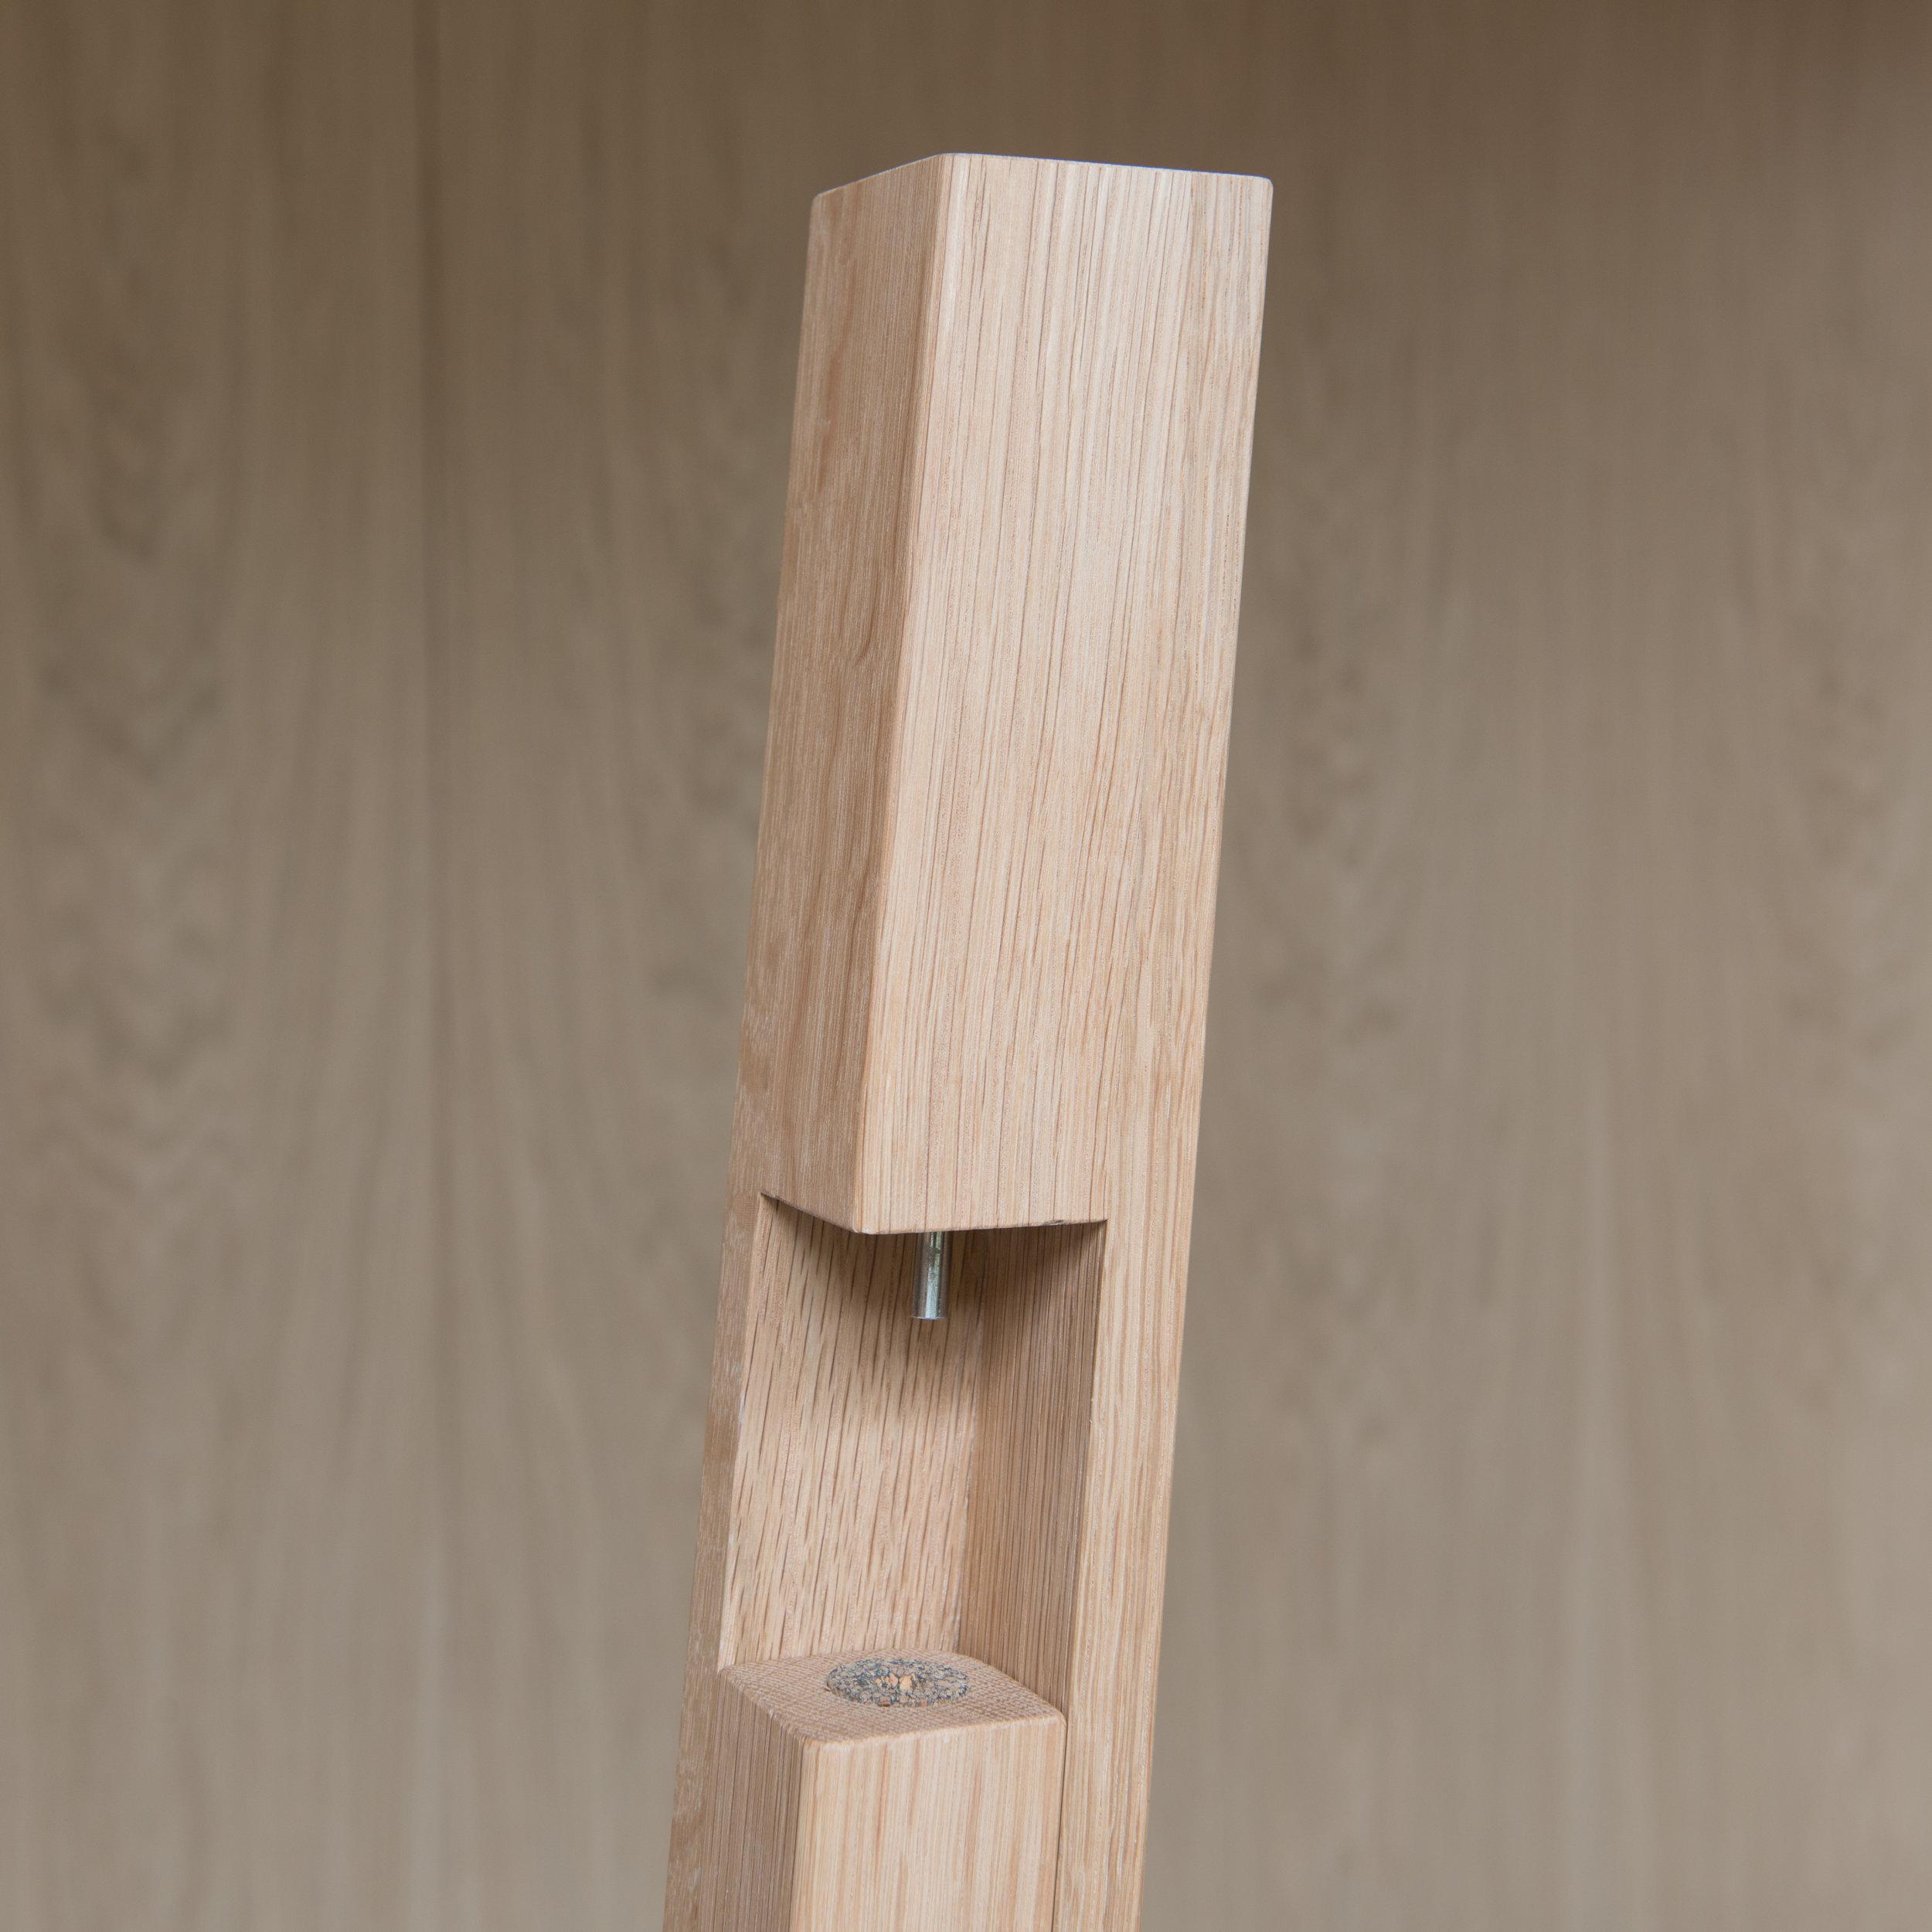 180424 Royal Holloway table-4556.jpg